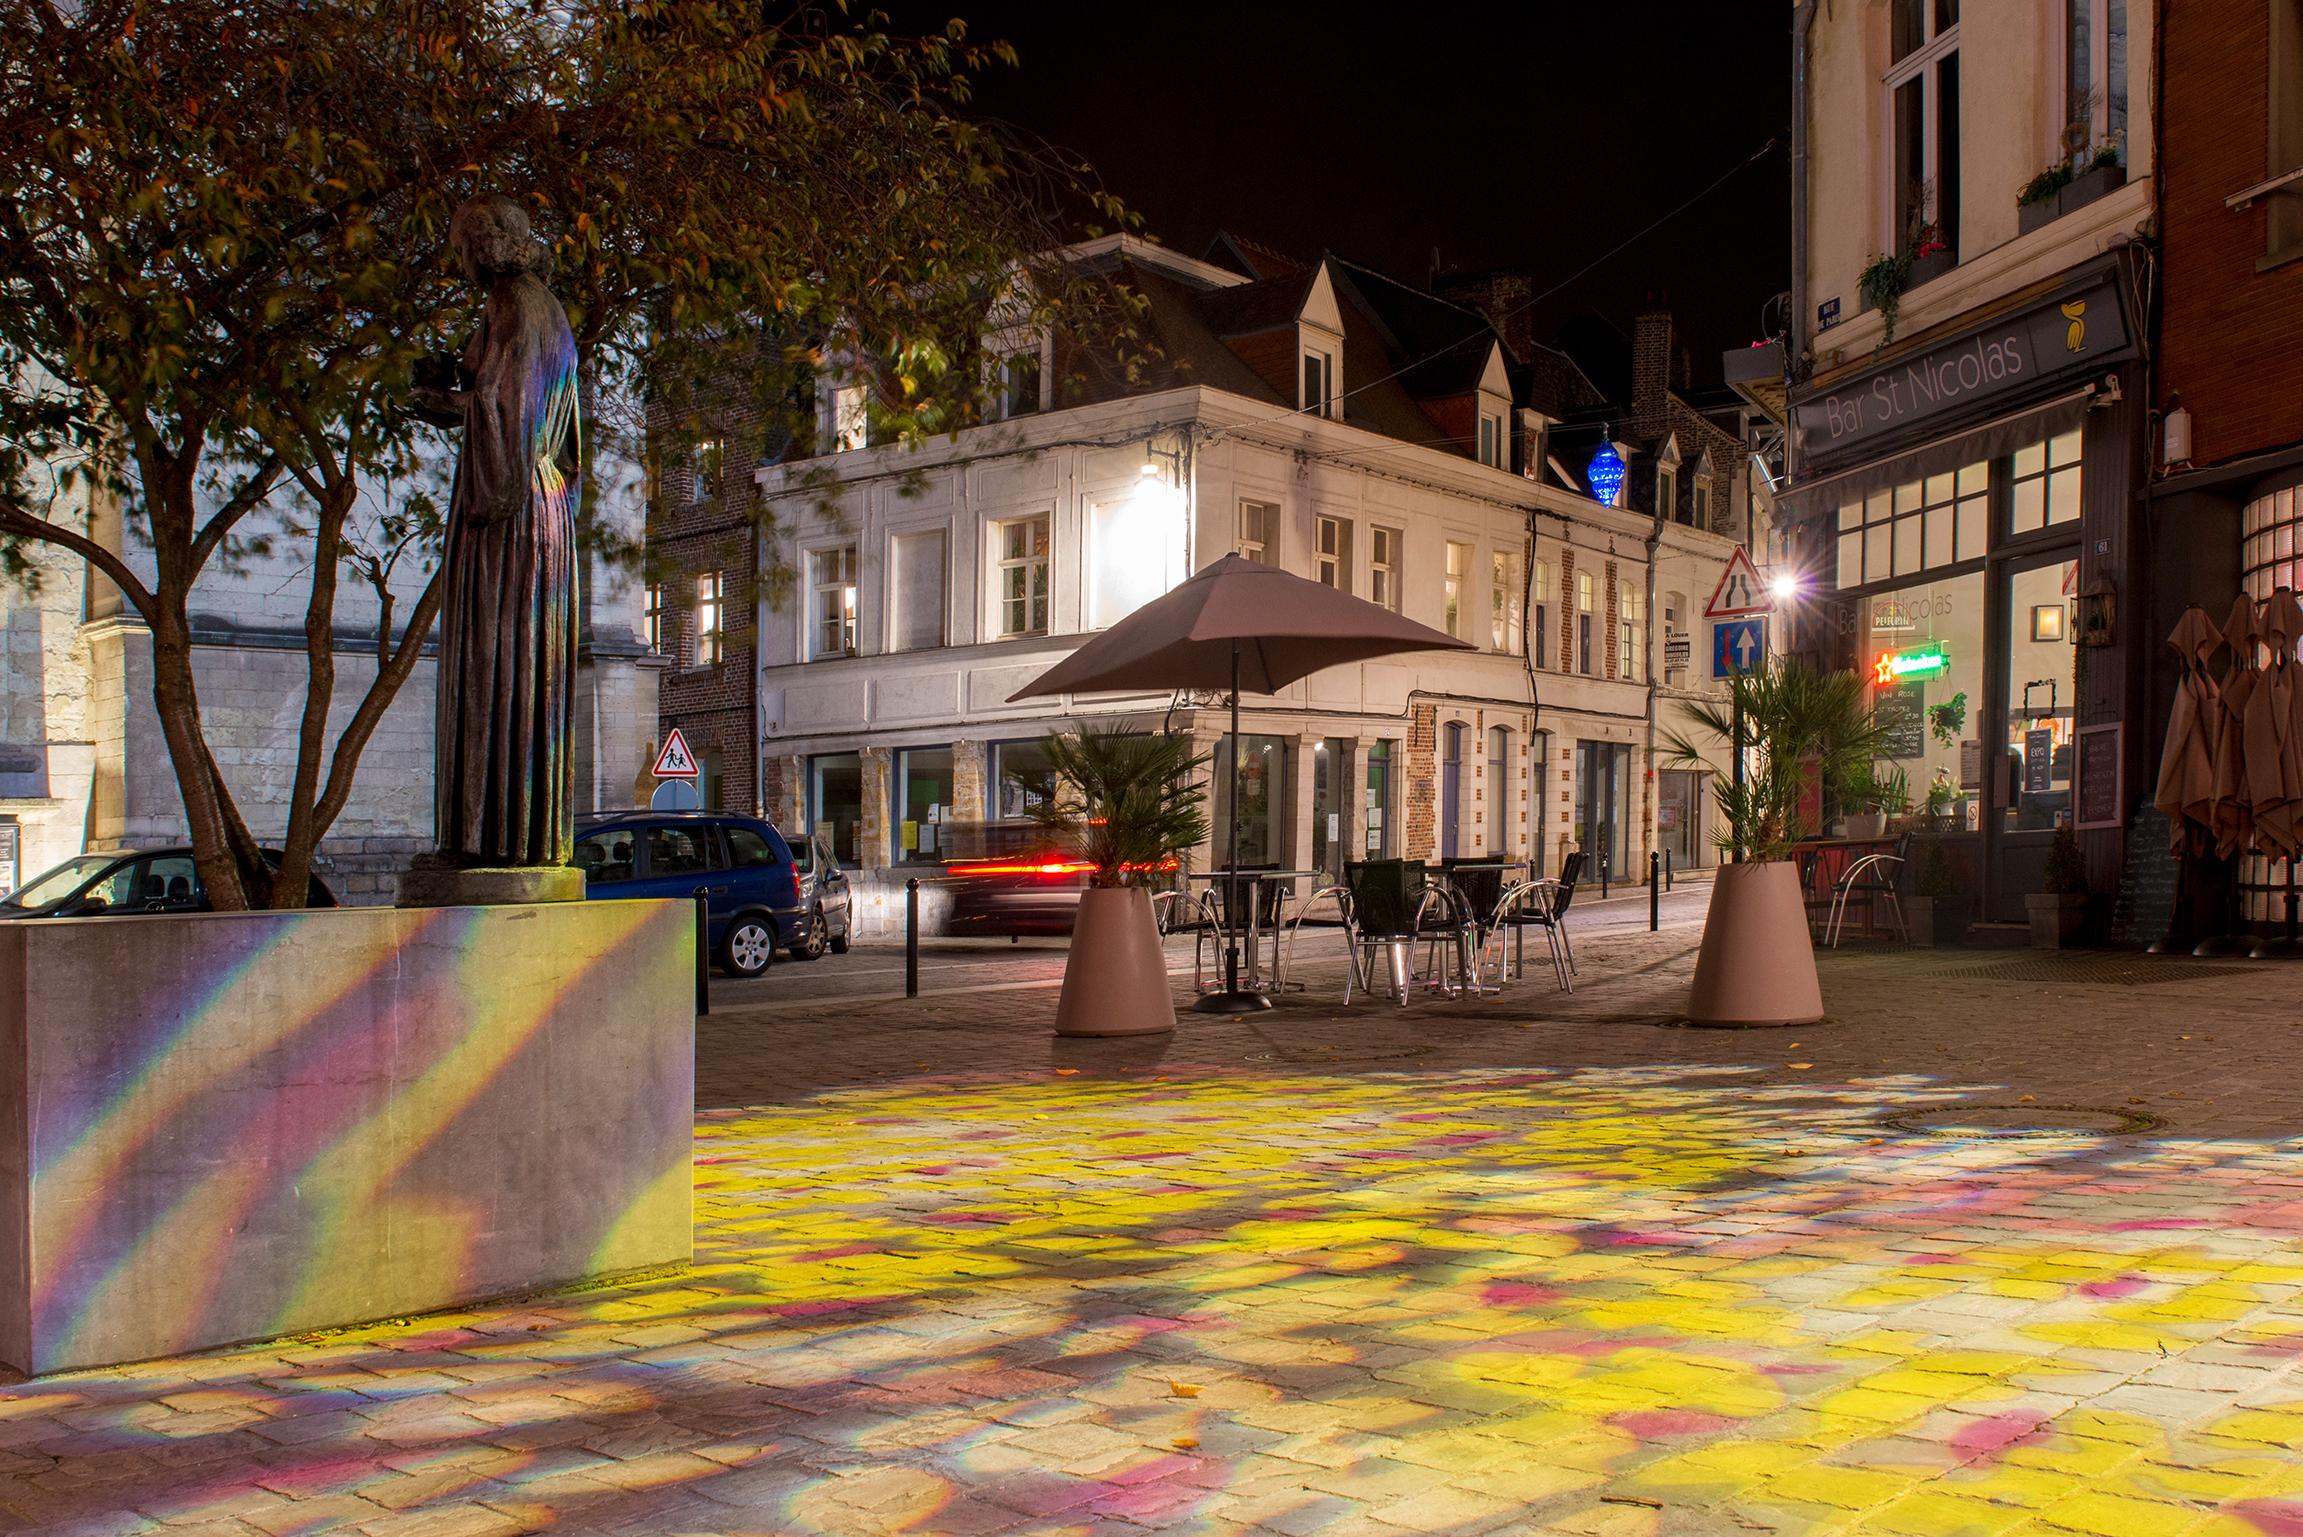 Interlude-nocturne_Place-Saint-Nicolas_Agence-Concepto_Cr_dit-Thomas-Douvry-1463829832.jpg